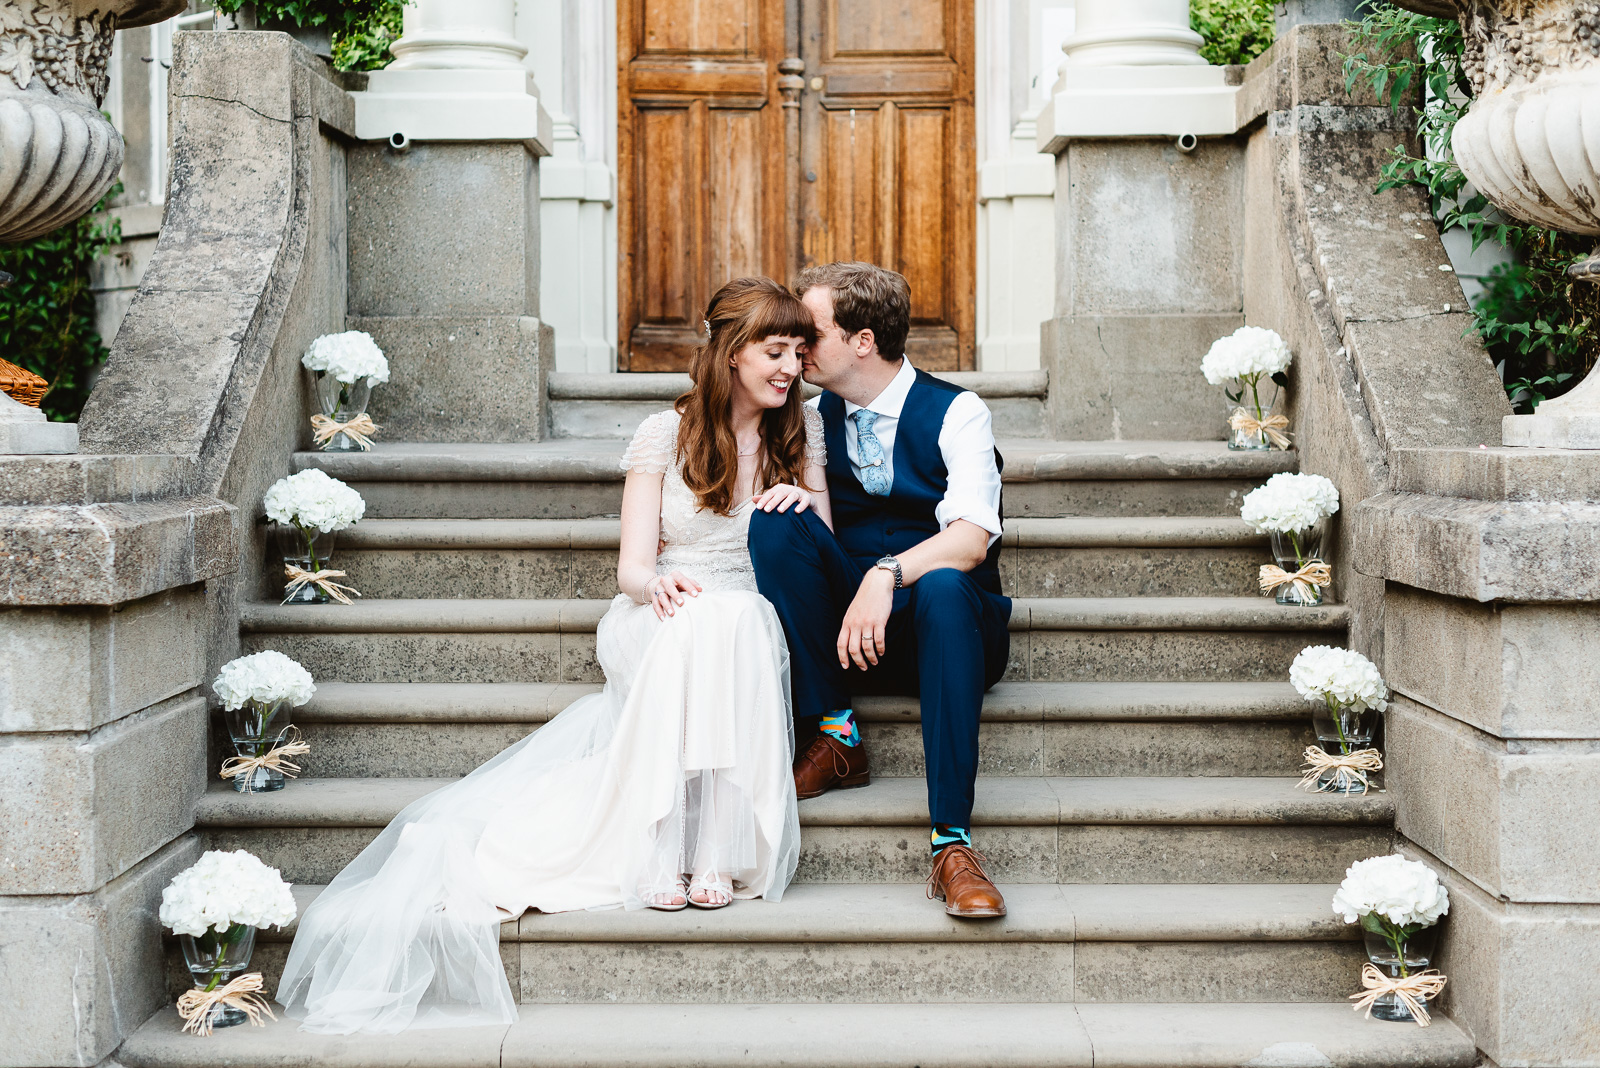 Bride-Groom-cuddling-hampton-court-house